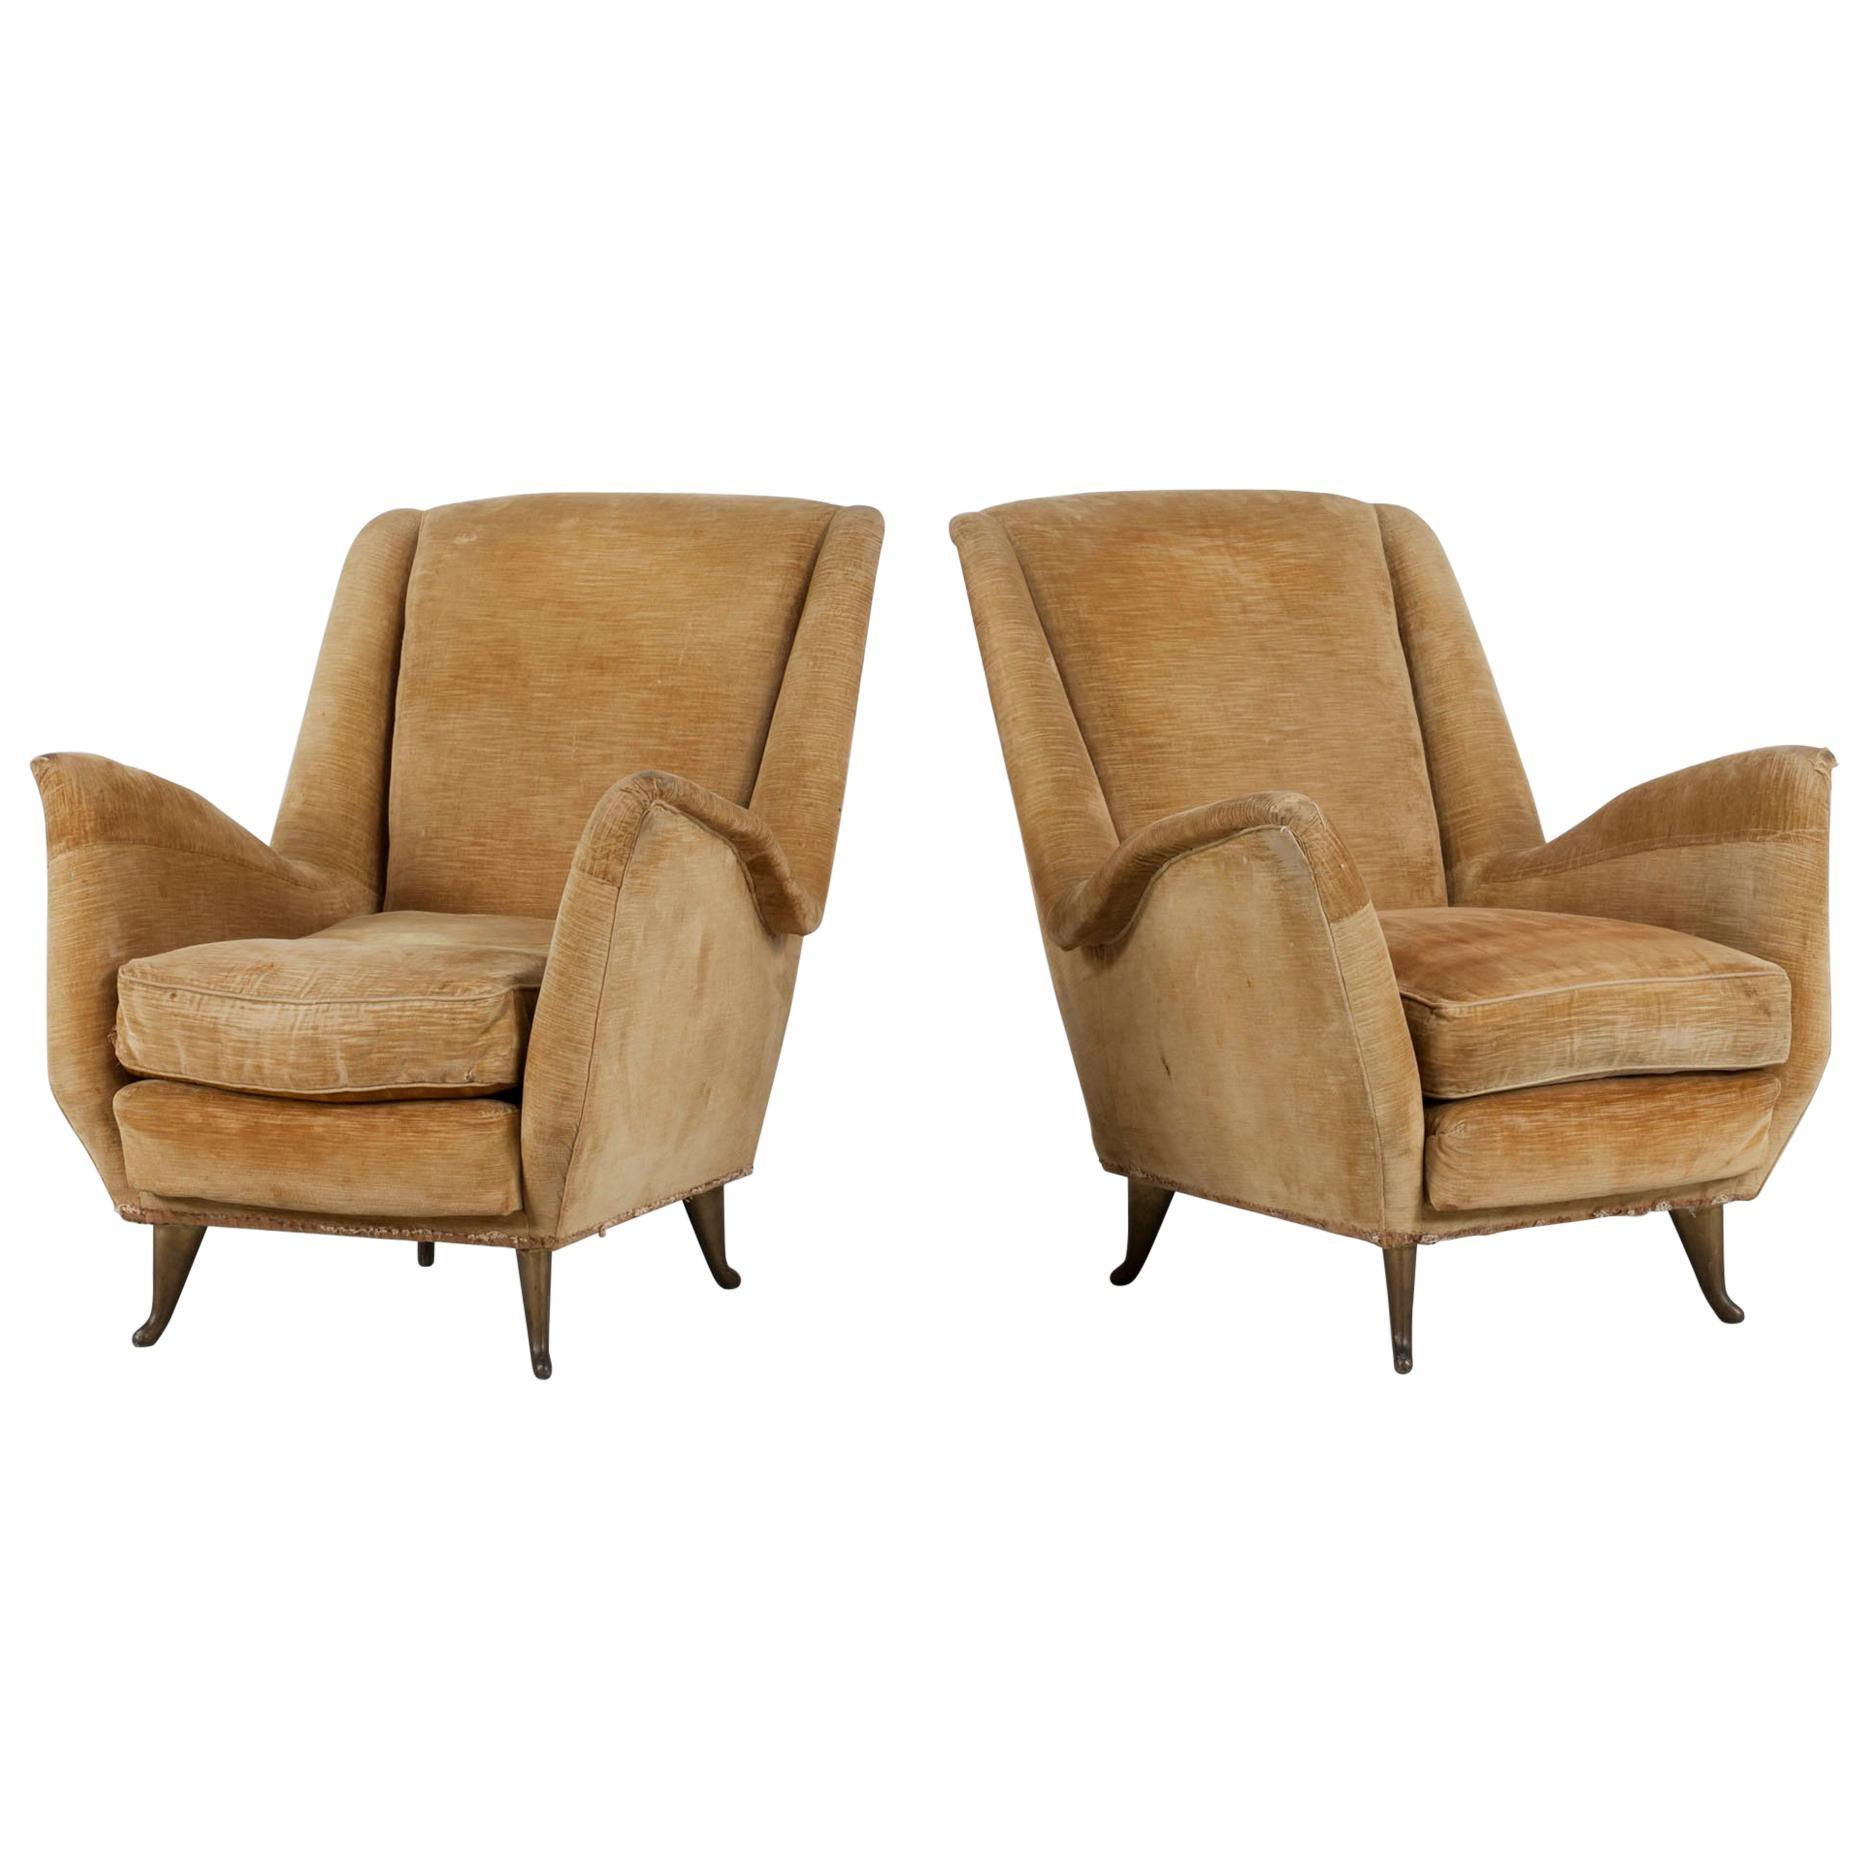 I. S. A. Bergamo Italian Set of Two Cream Coloured Wingback Chairs, 1950s